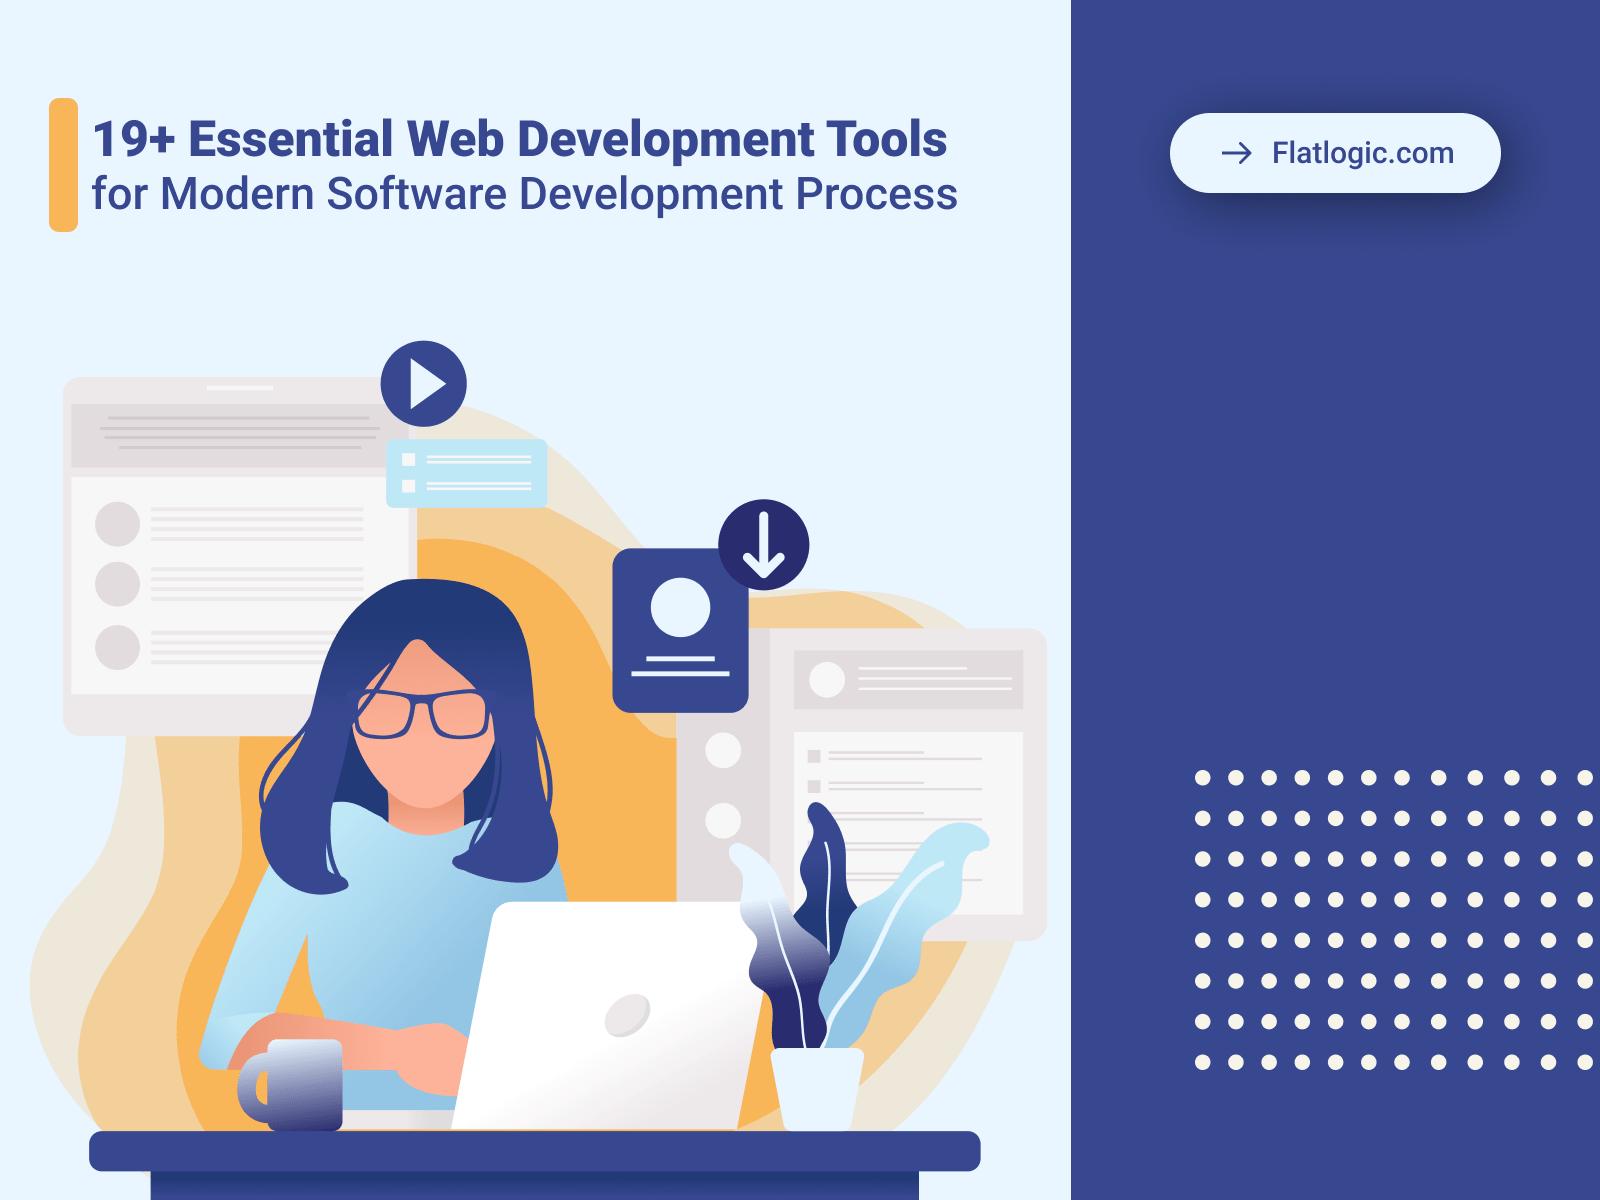 19+ Essential Web Development Tools for the Modern Software Development Process